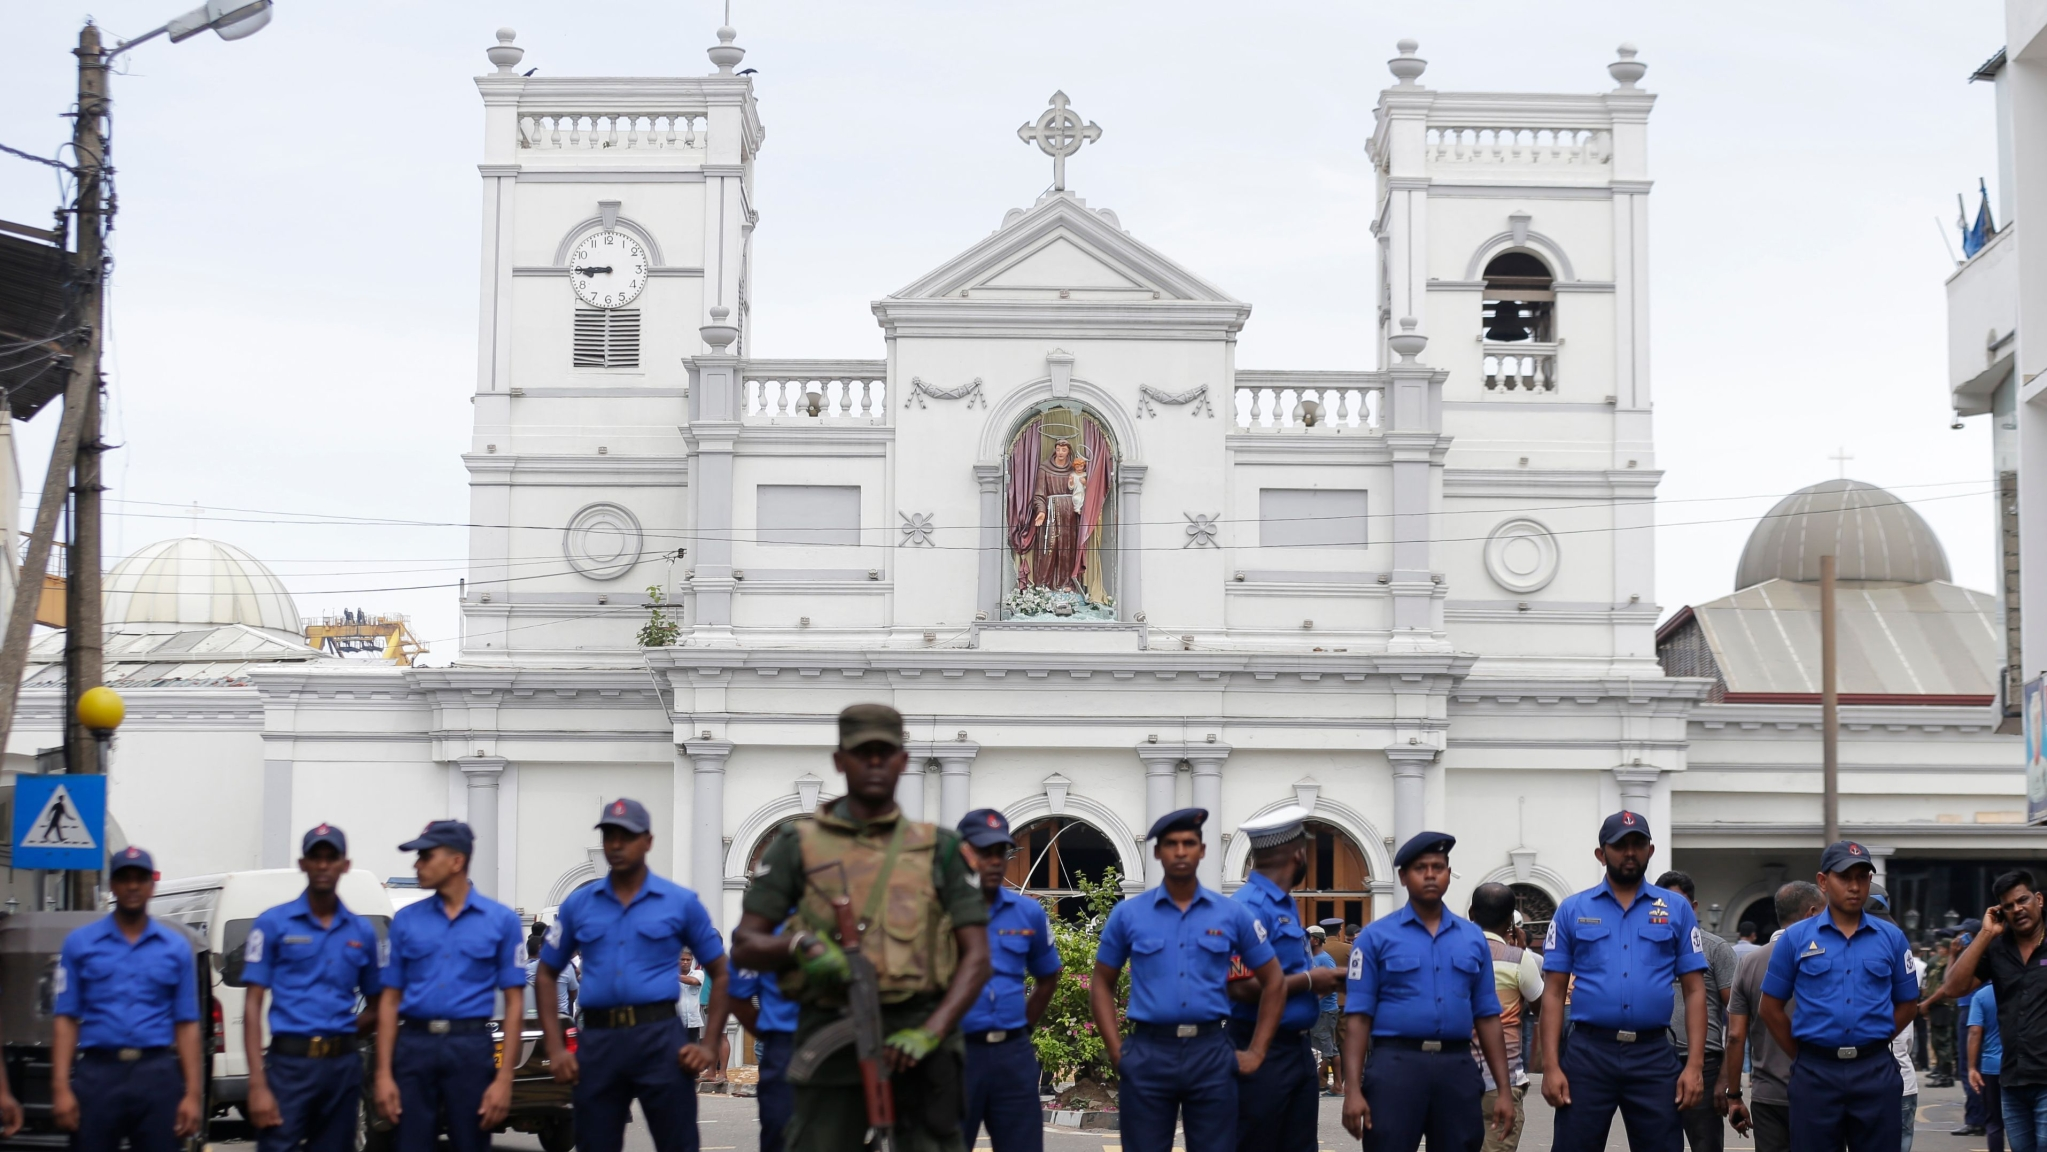 #PrayForSriLanka: Instagram Artists Pay Homage to Blast Victims